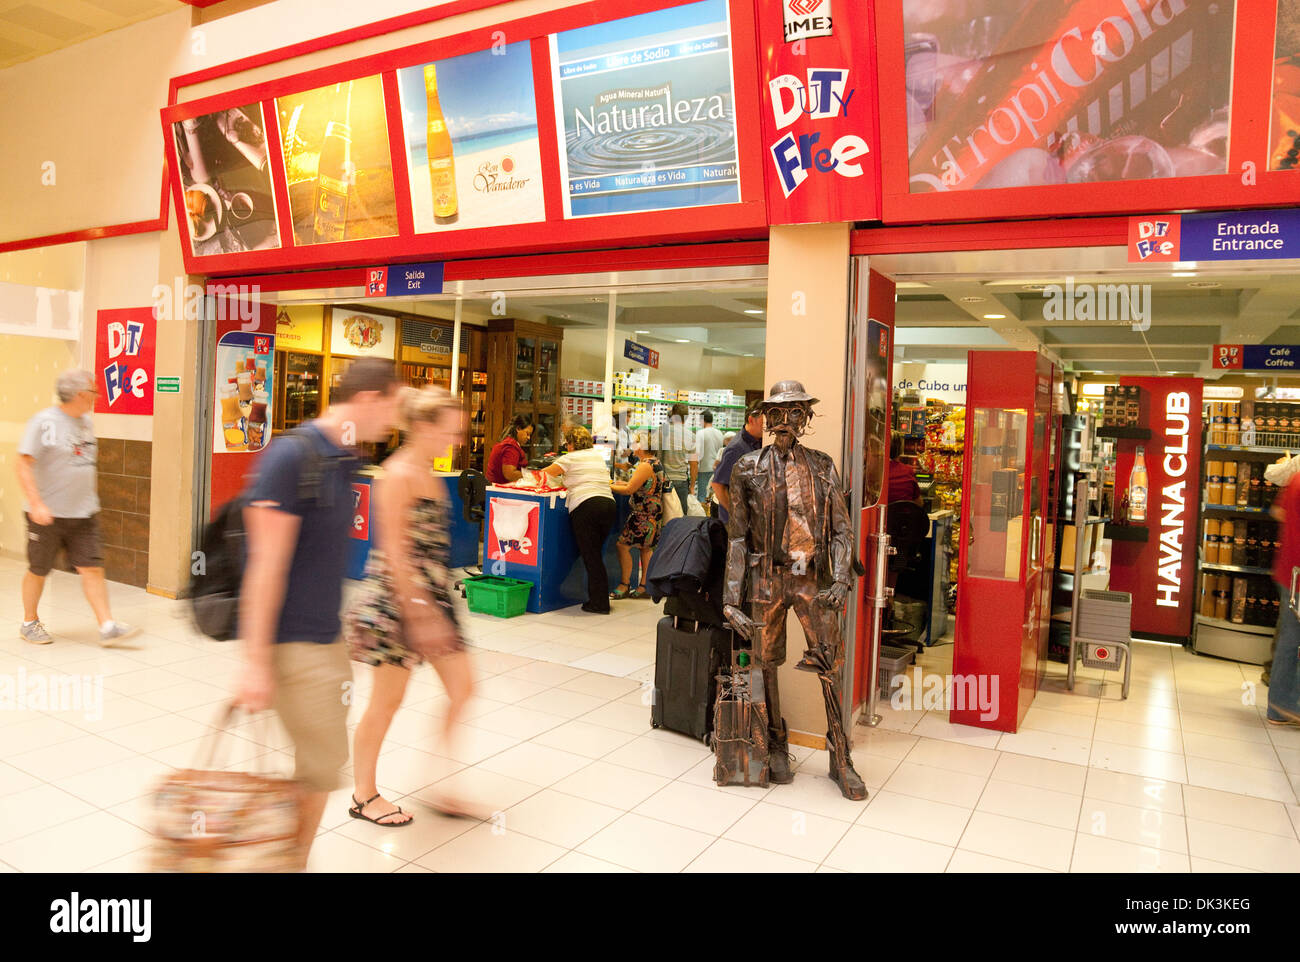 Aeroporto Havana Arrivi : Duty free shop store jose marti international airport havana